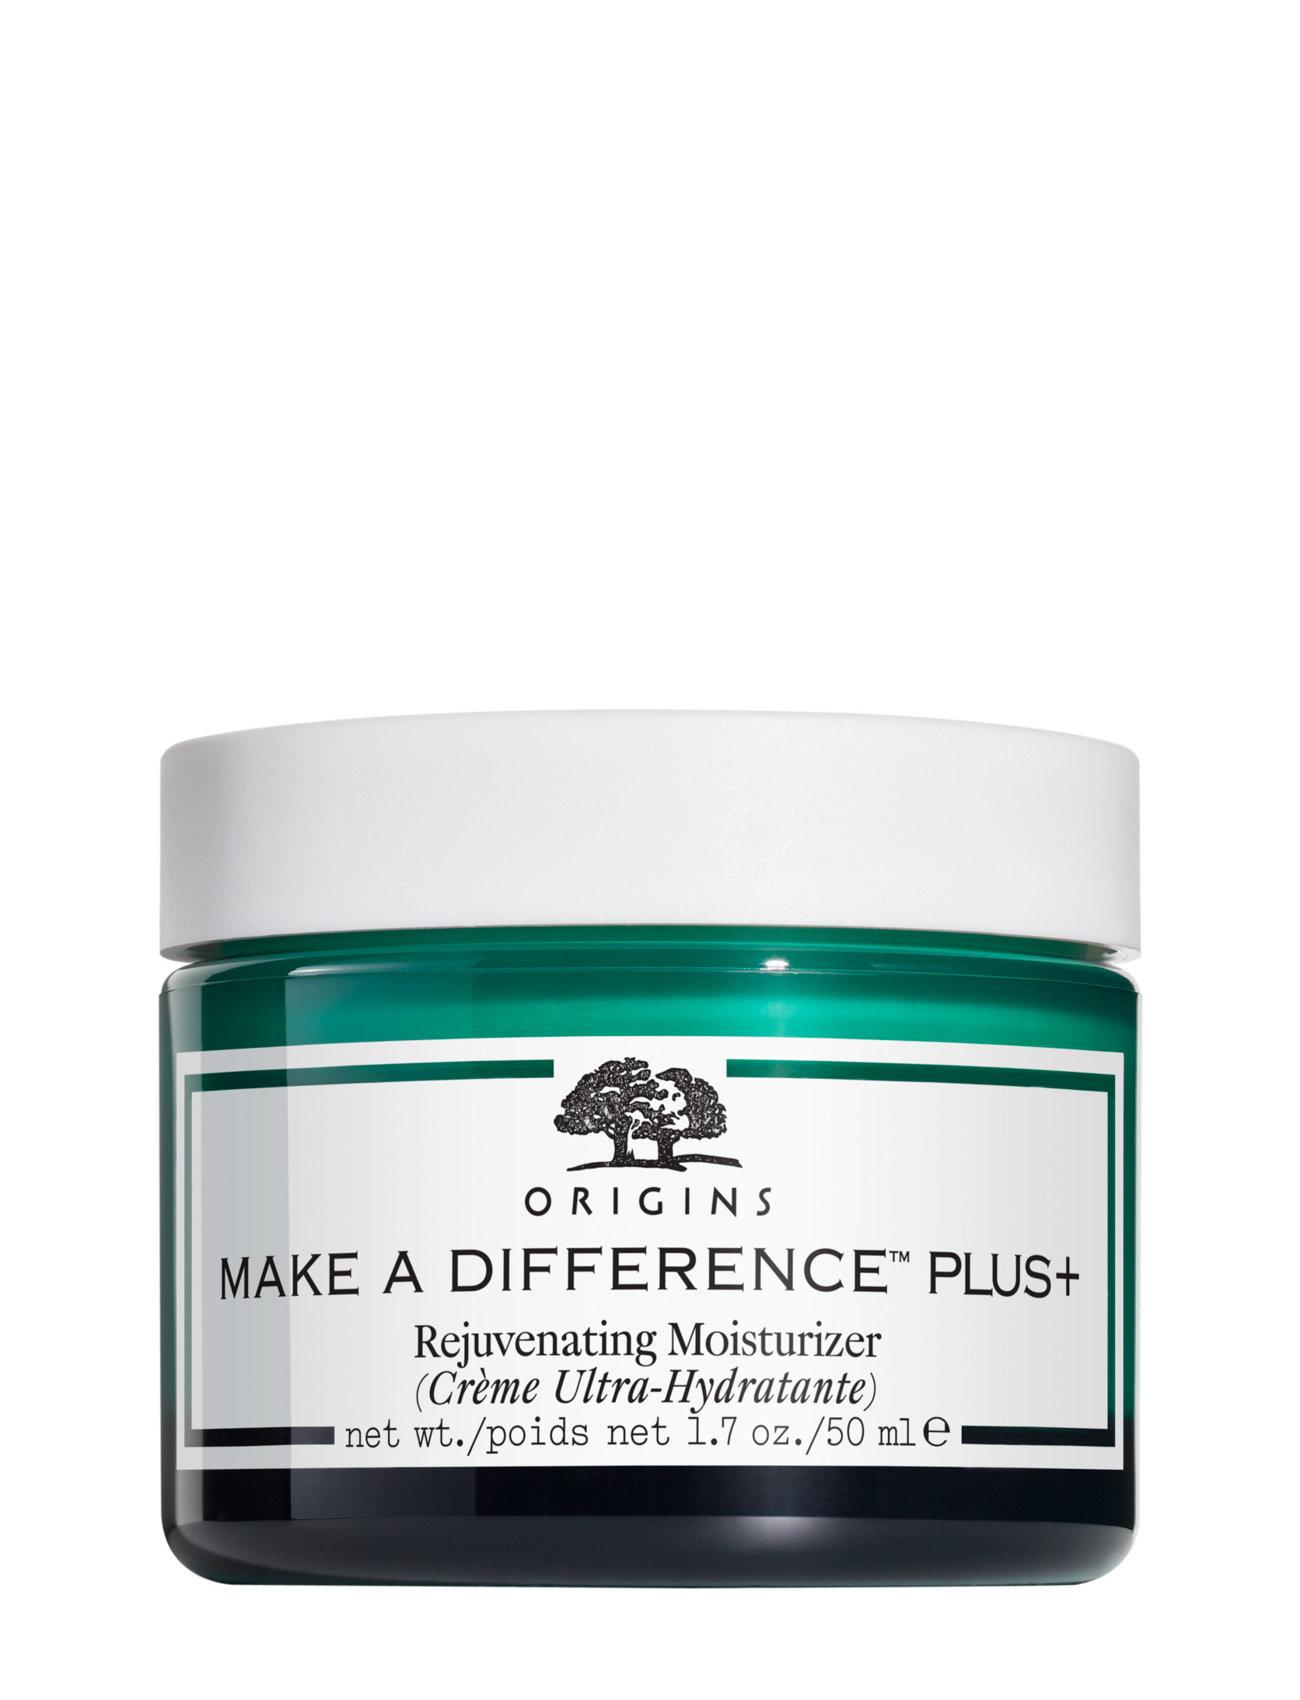 origins – Make a difference™ plus + rejuvenating moisturizer fra boozt.com dk